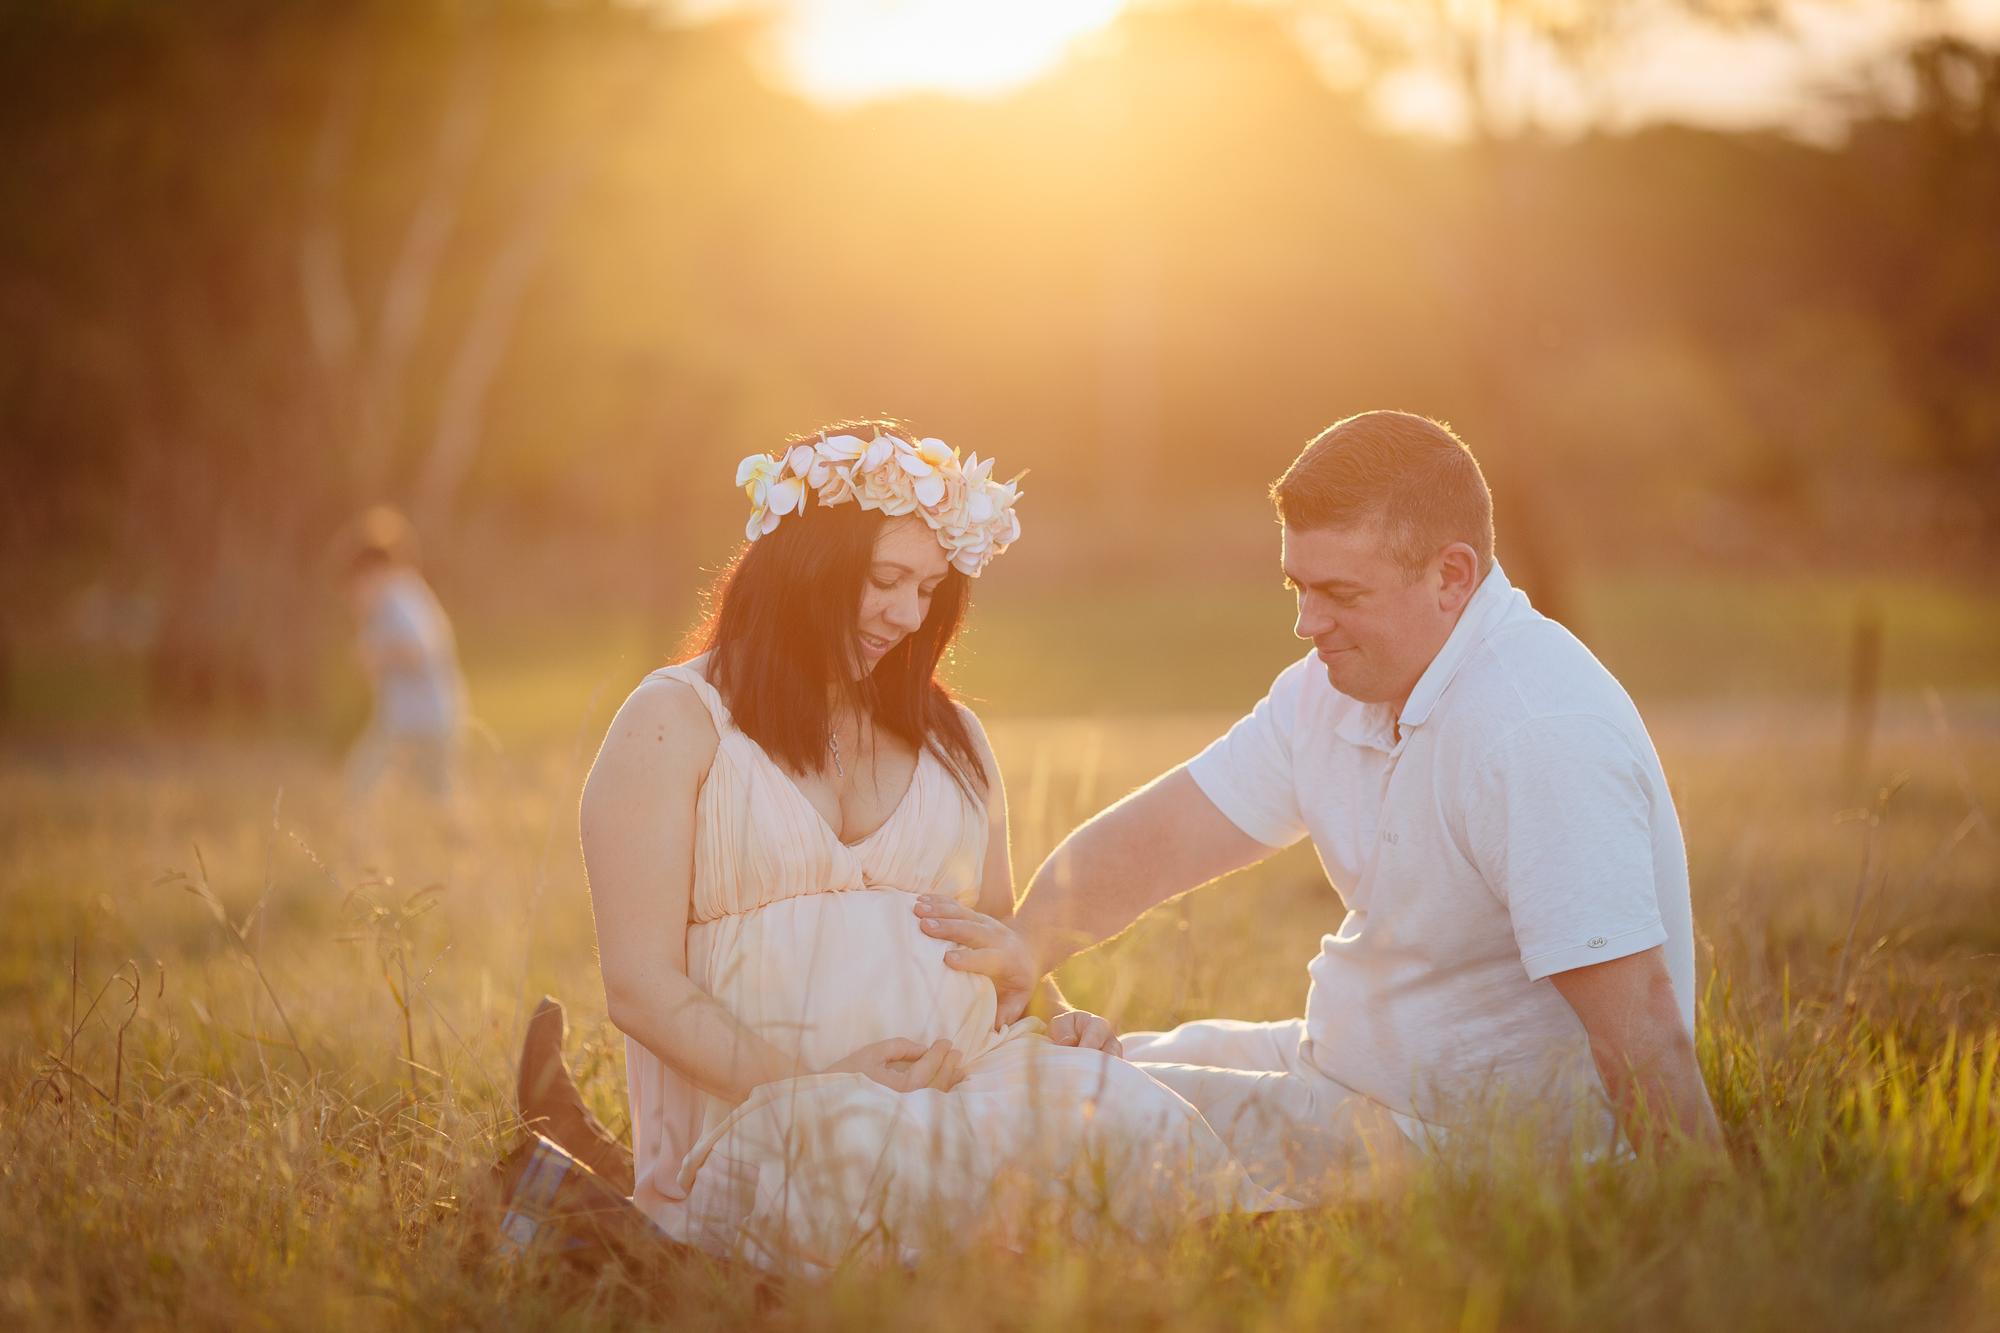 100_Maternity Lifetsyle_Shelley_Sunlight Photography.JPG